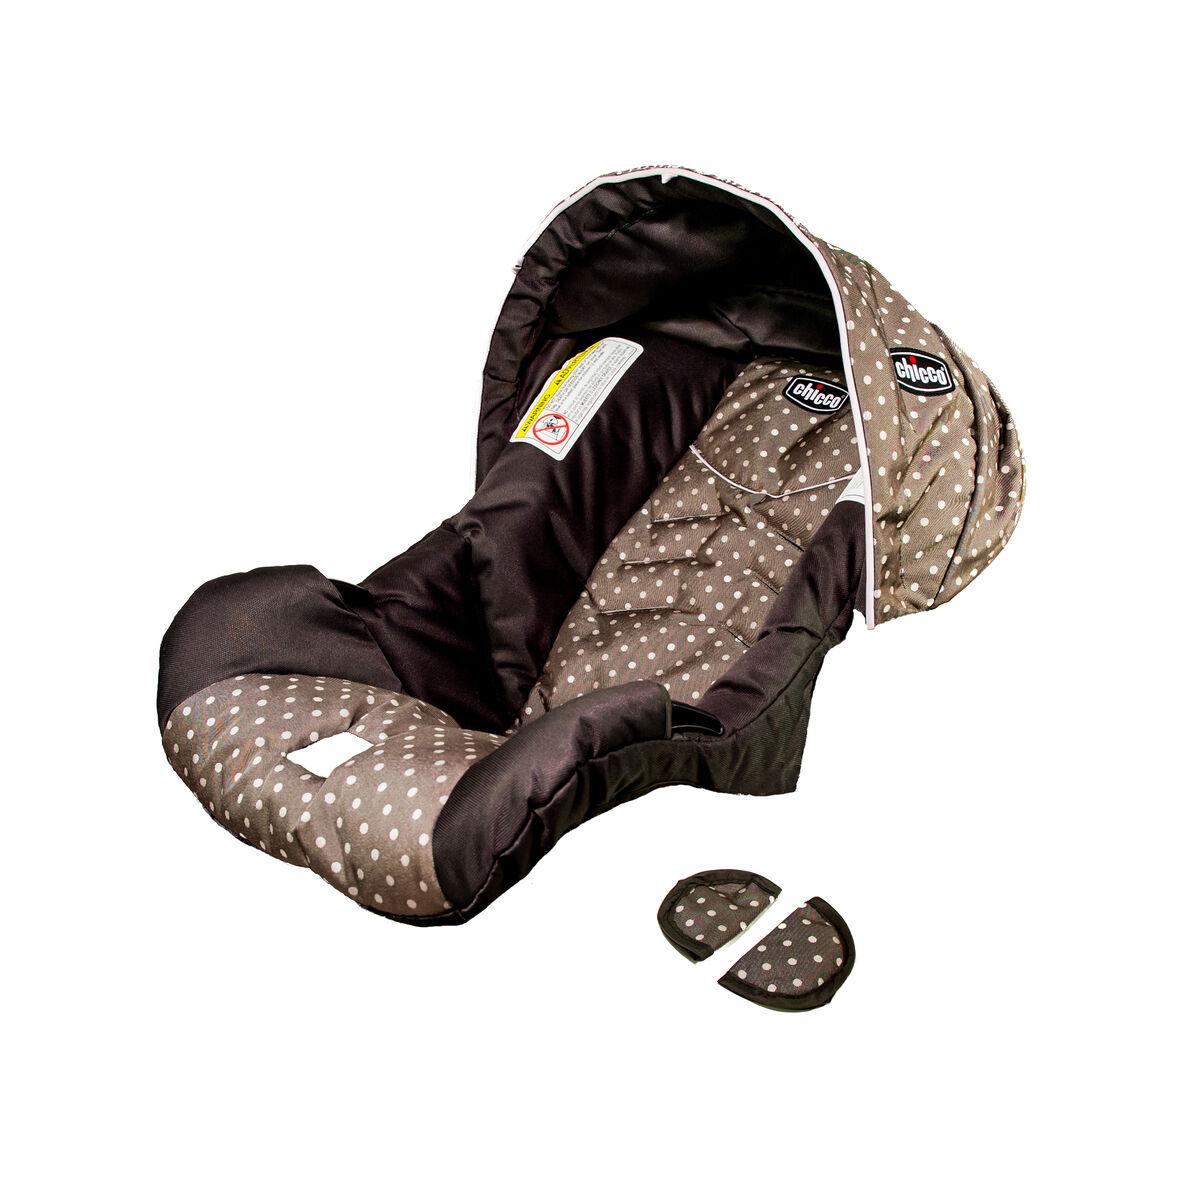 Keyfit  Infant Car Seat Cover